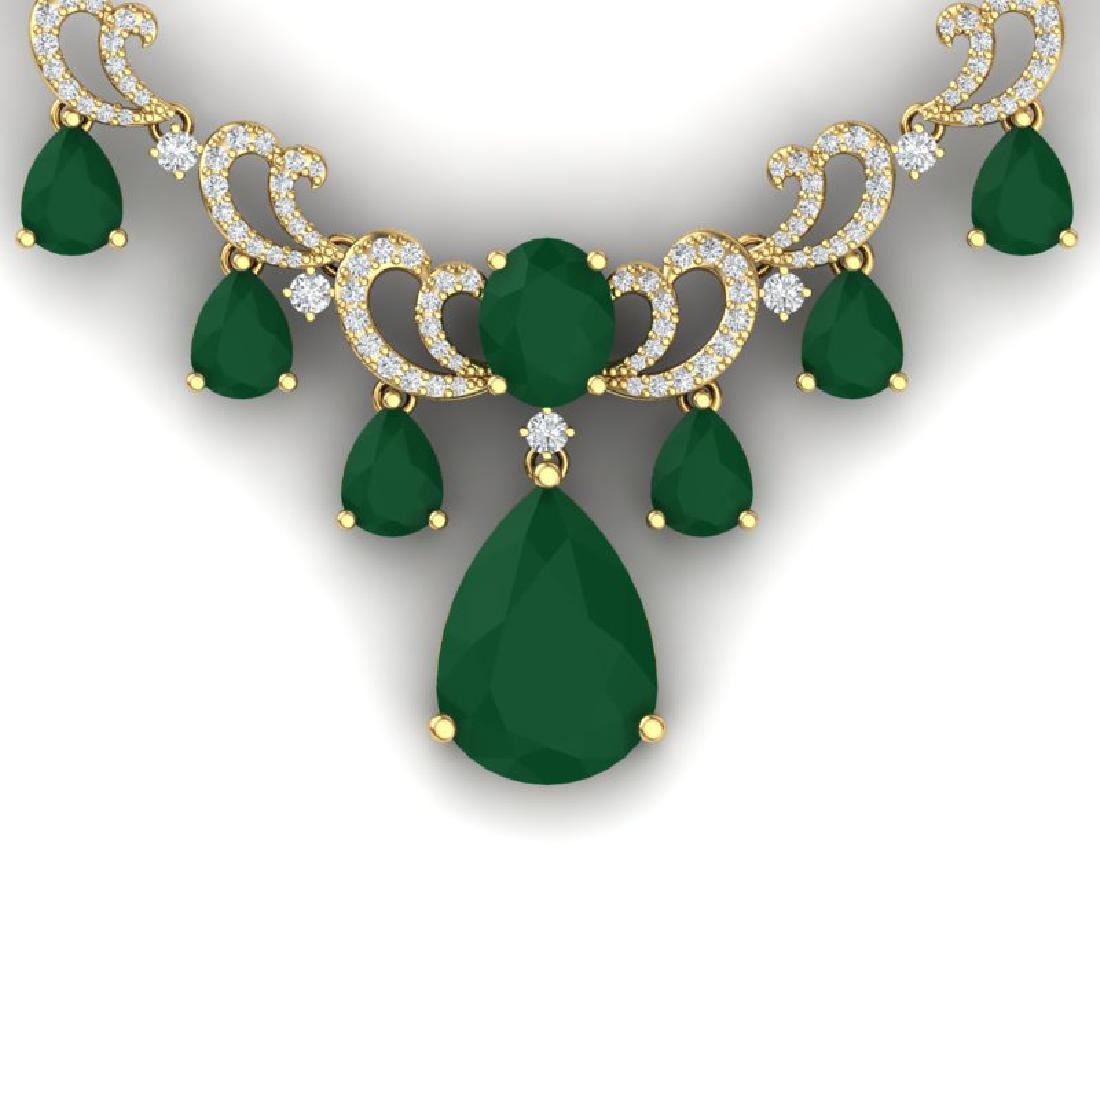 36.85 CTW Royalty Emerald & VS Diamond Necklace 18K